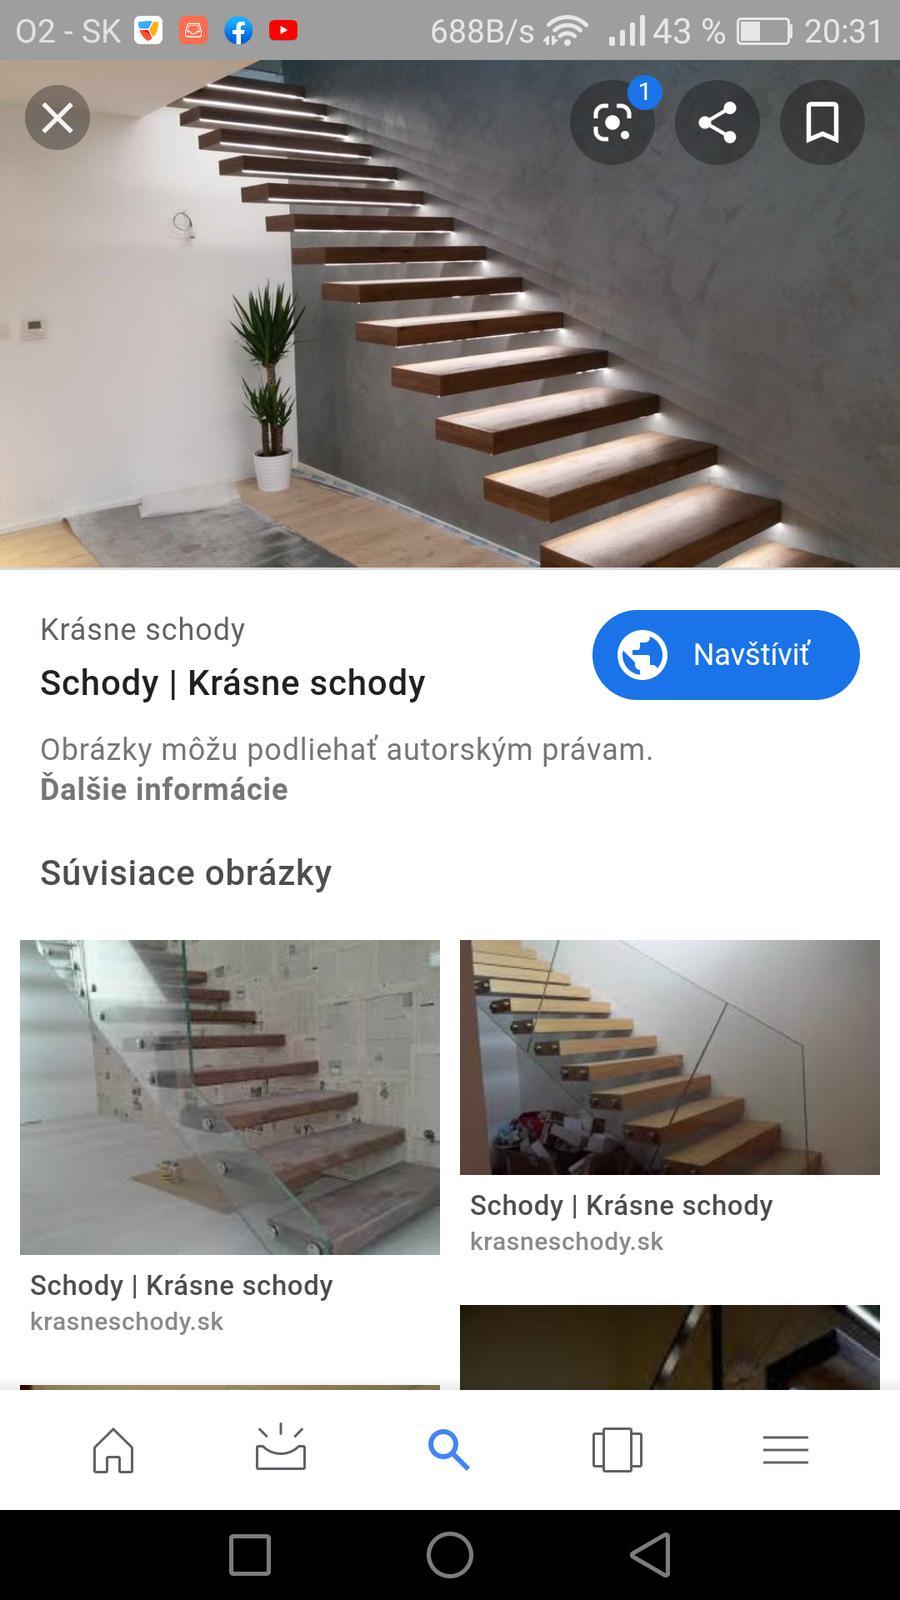 Konzolove schodisko (samonosne schody) - tak by to malo vypadat :)